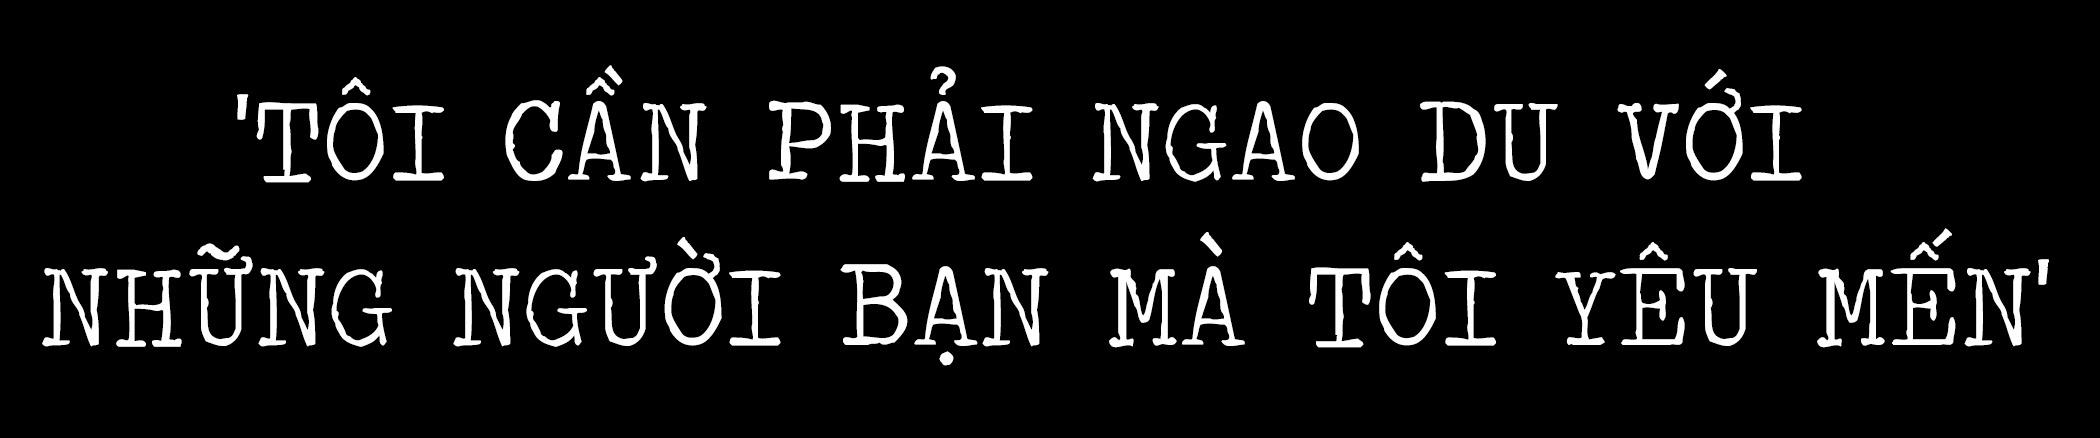 Linkin Park: Thanh am tuoi tre cua mot the he fan Viet hinh anh 7